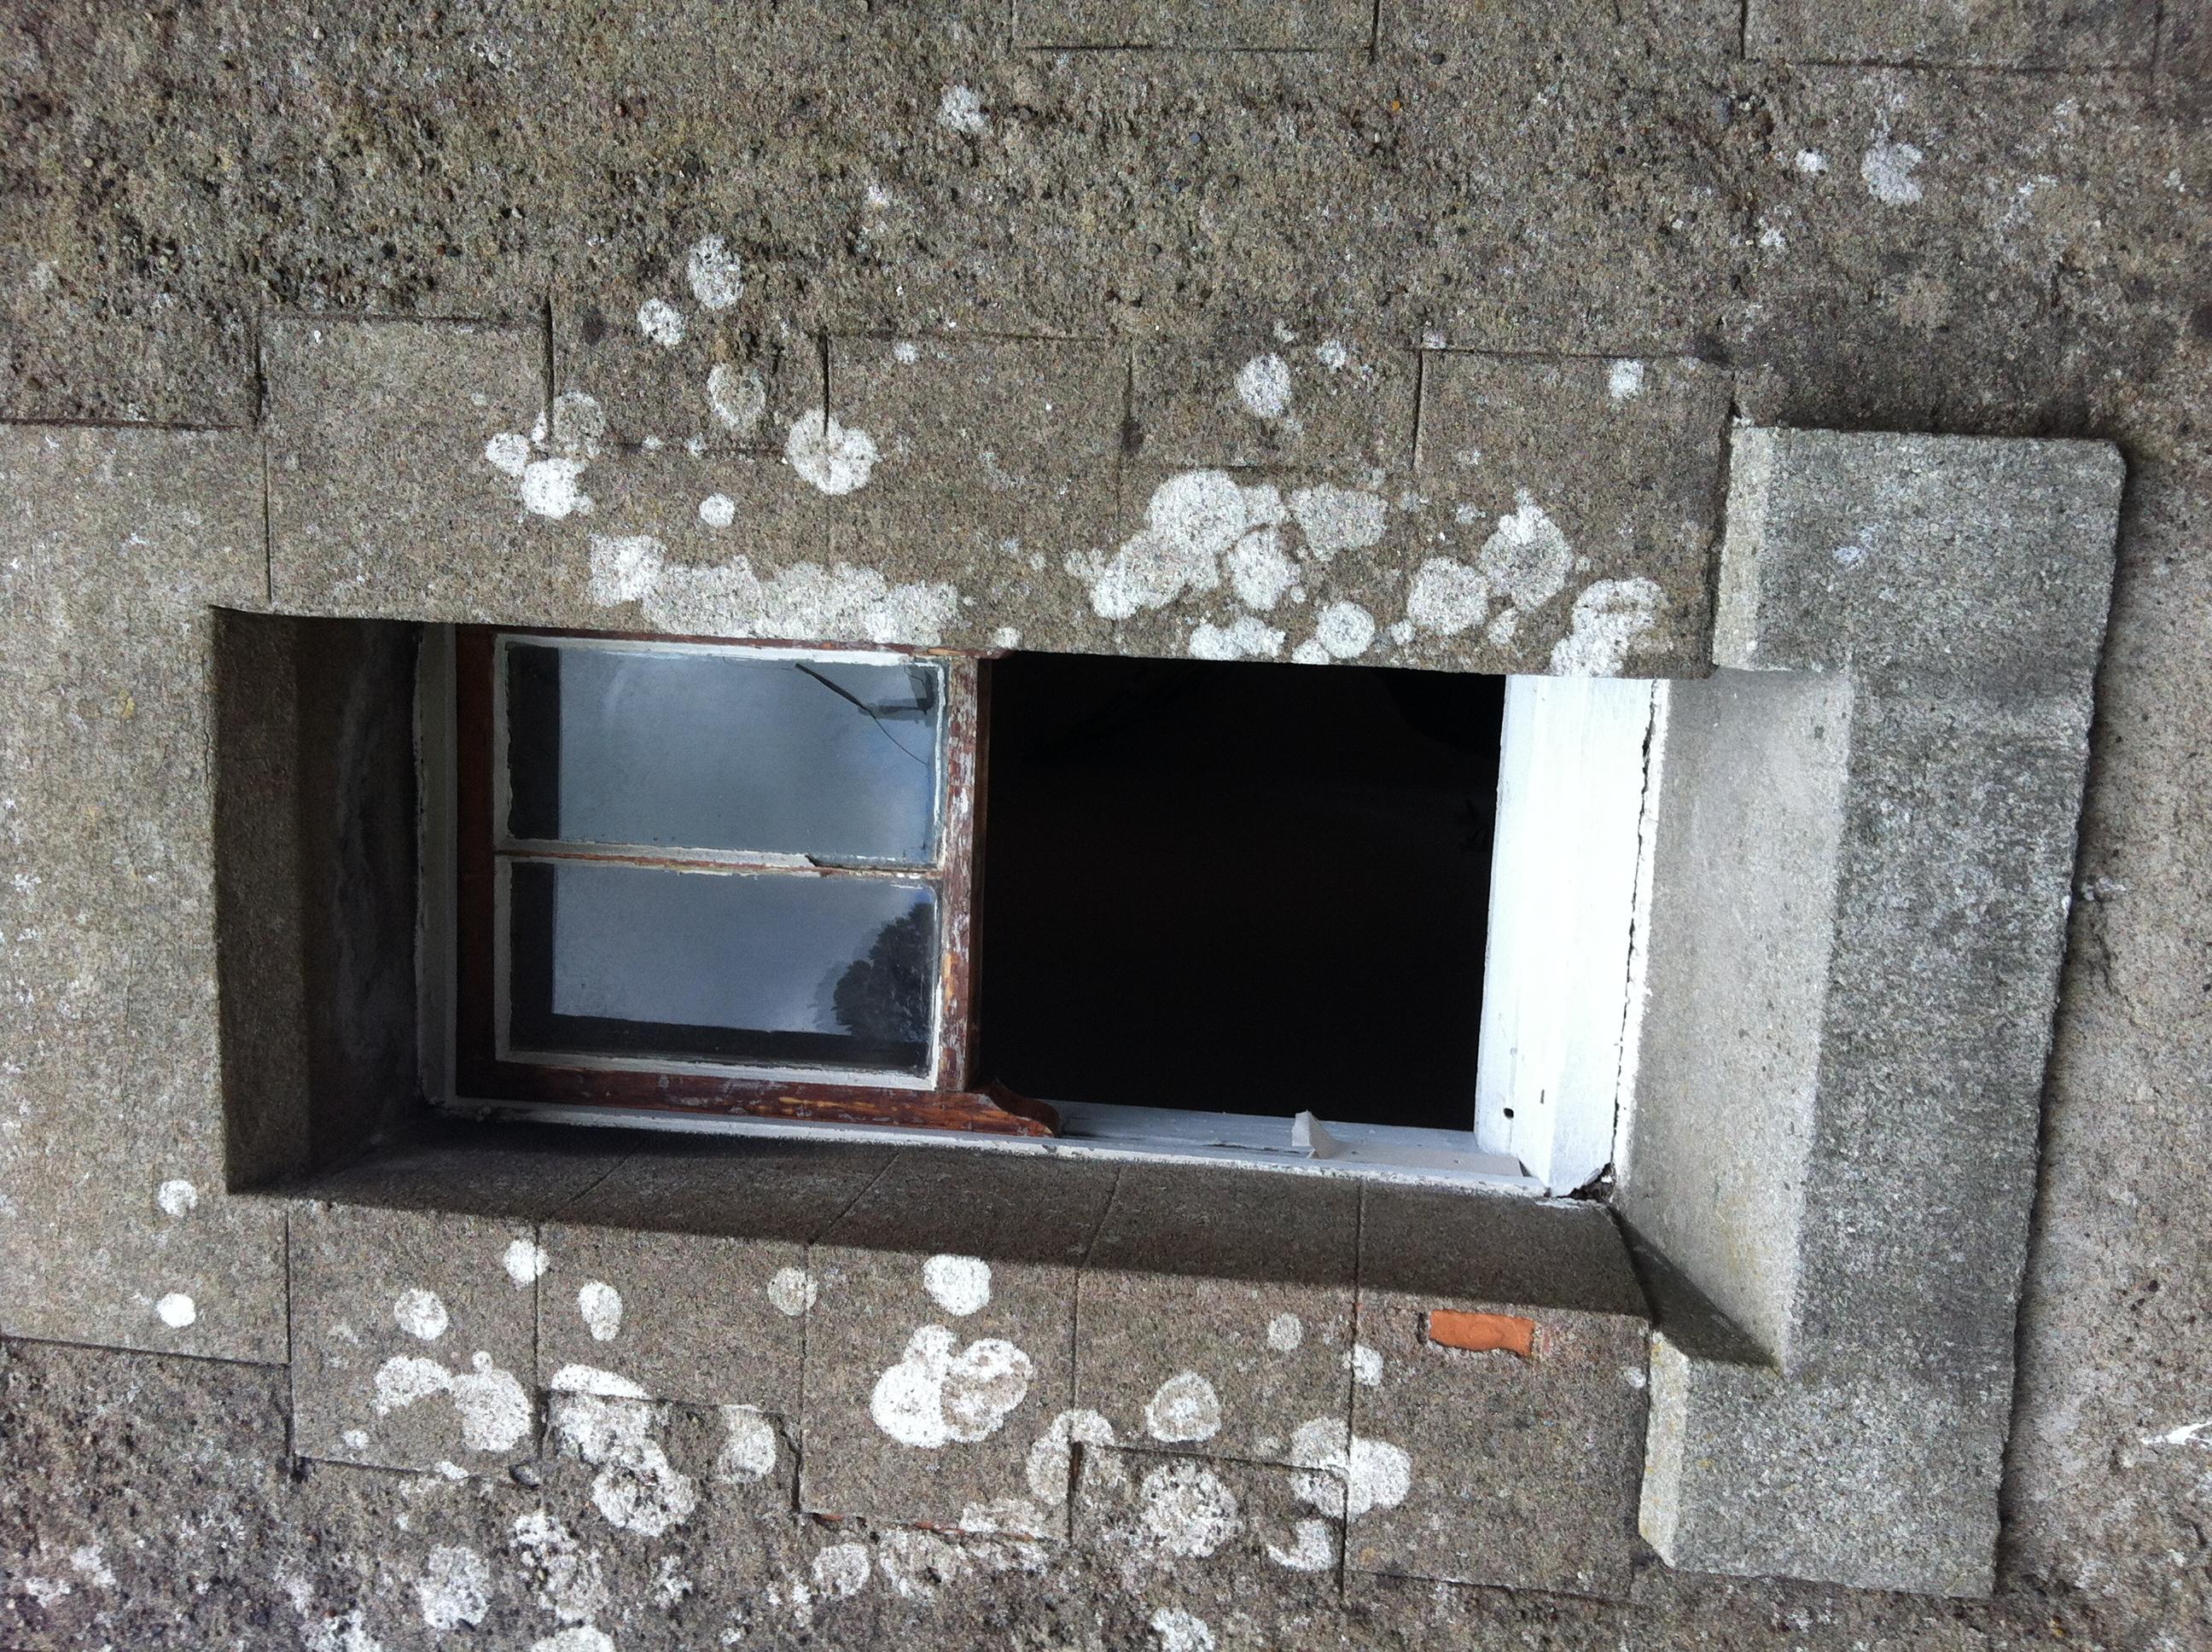 Removing sash window for restoration